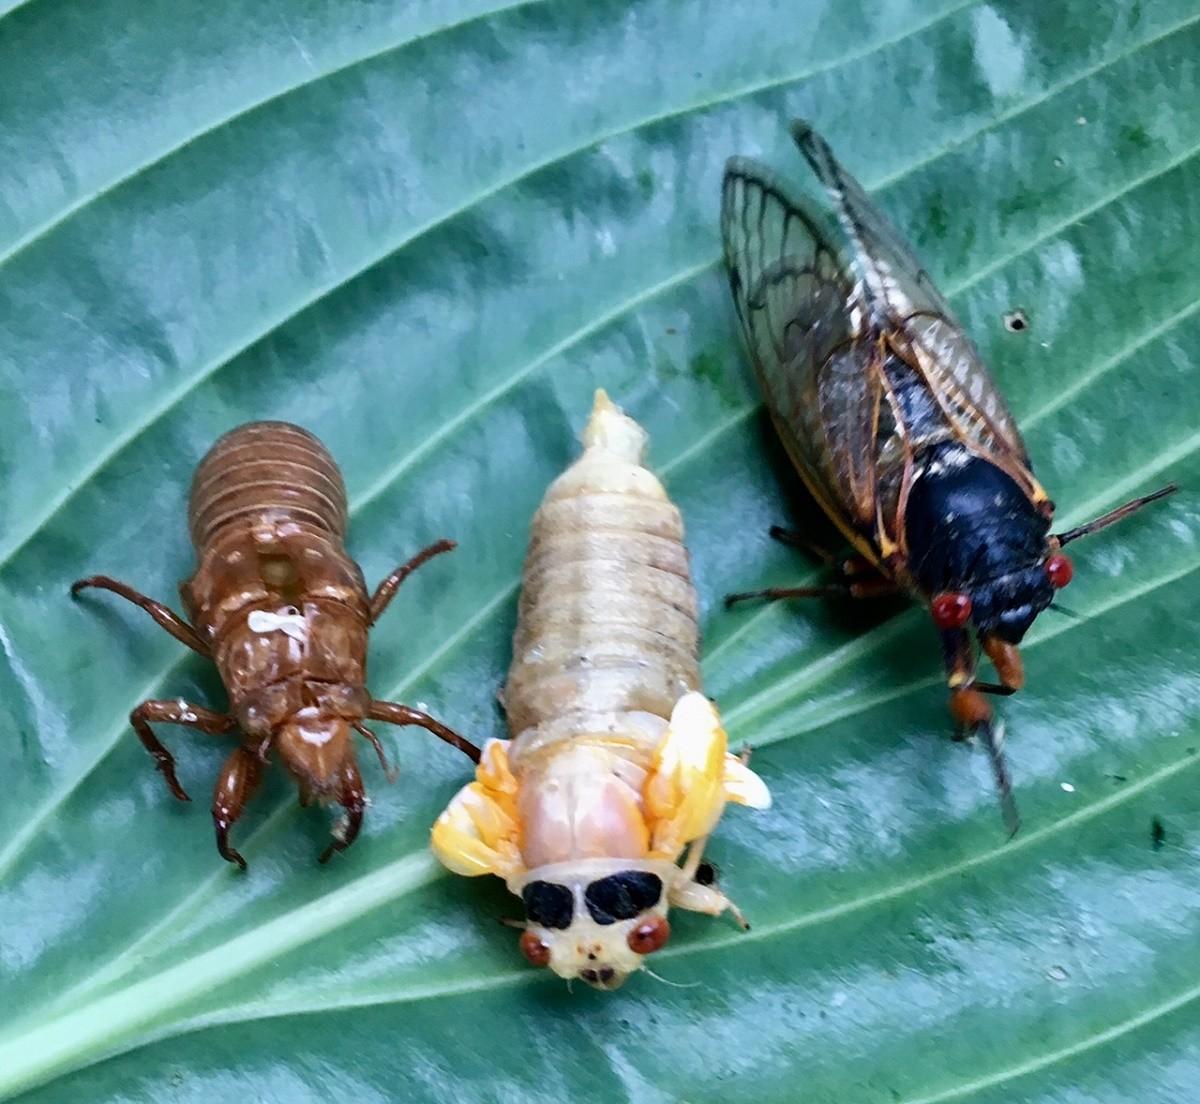 cicada - photo #5